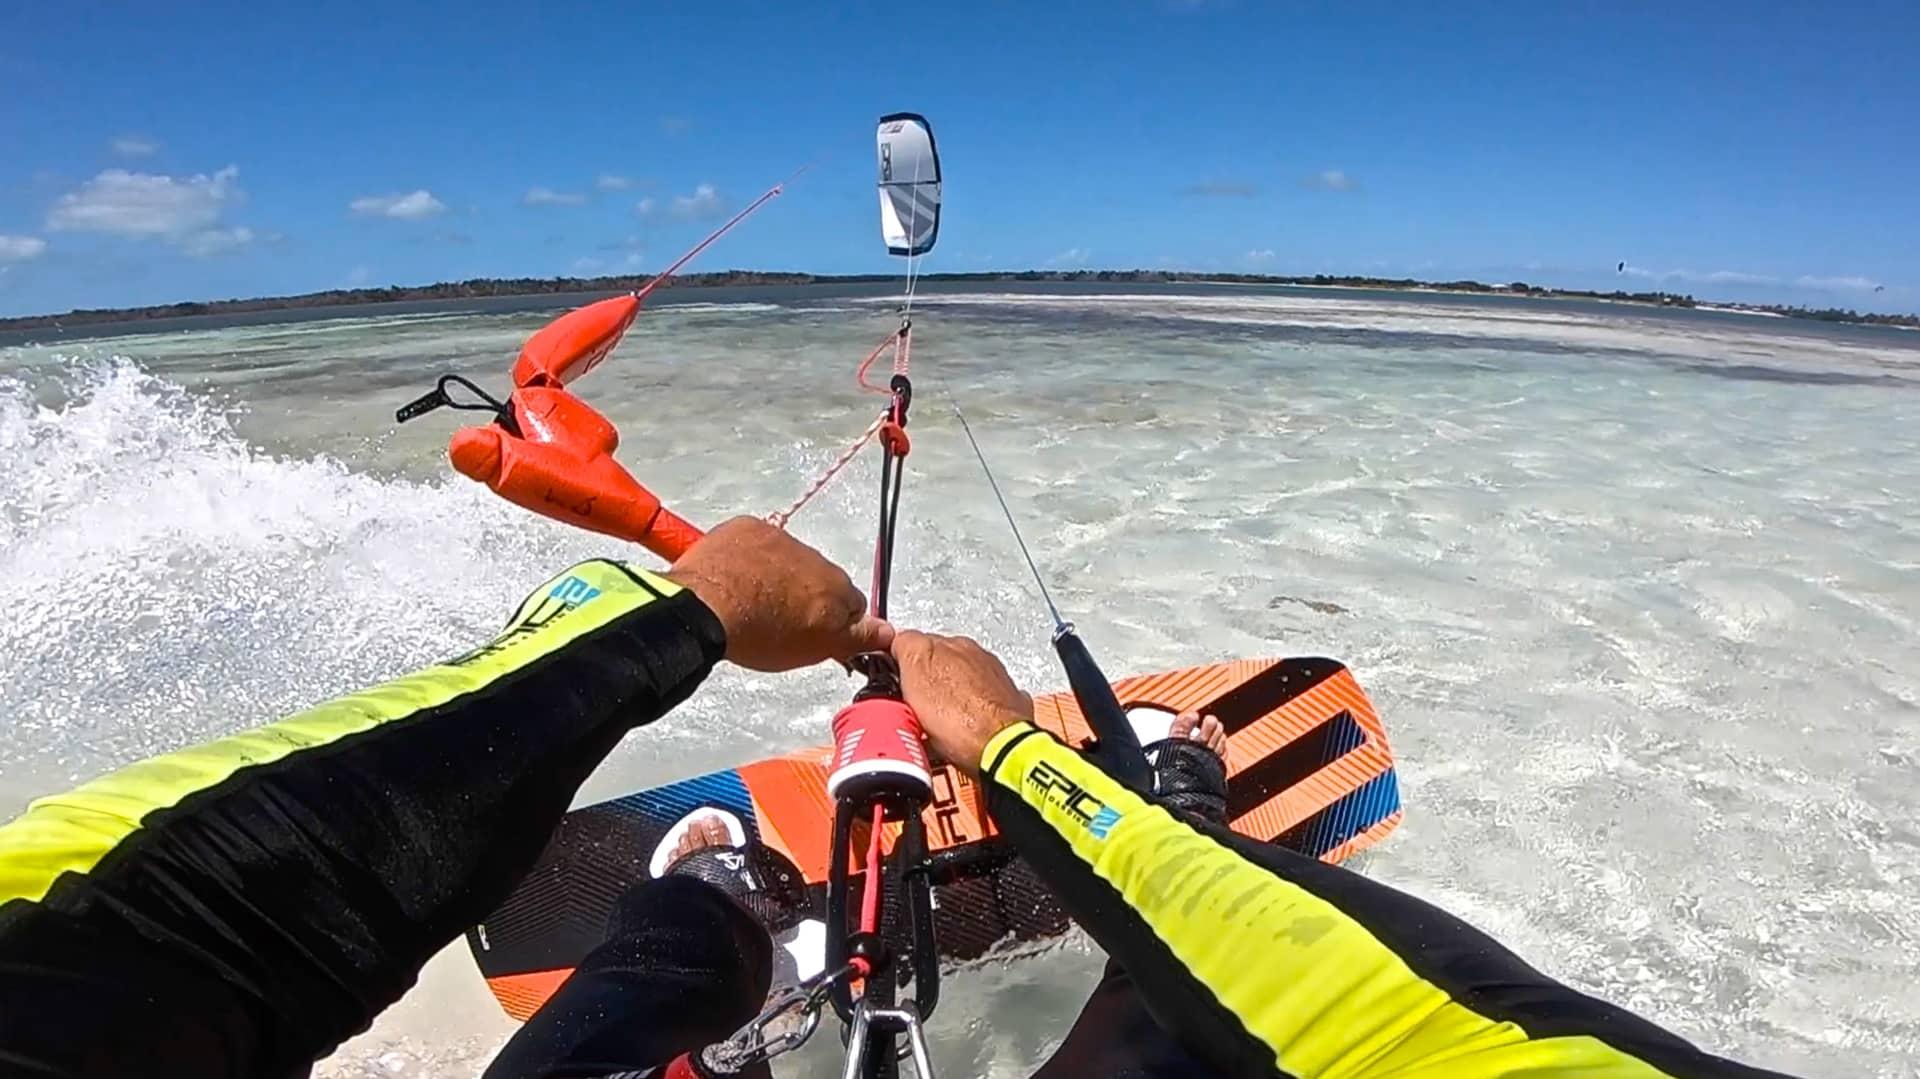 Kitesurfer rescues boaters - with Epic Kites Kiteboarding